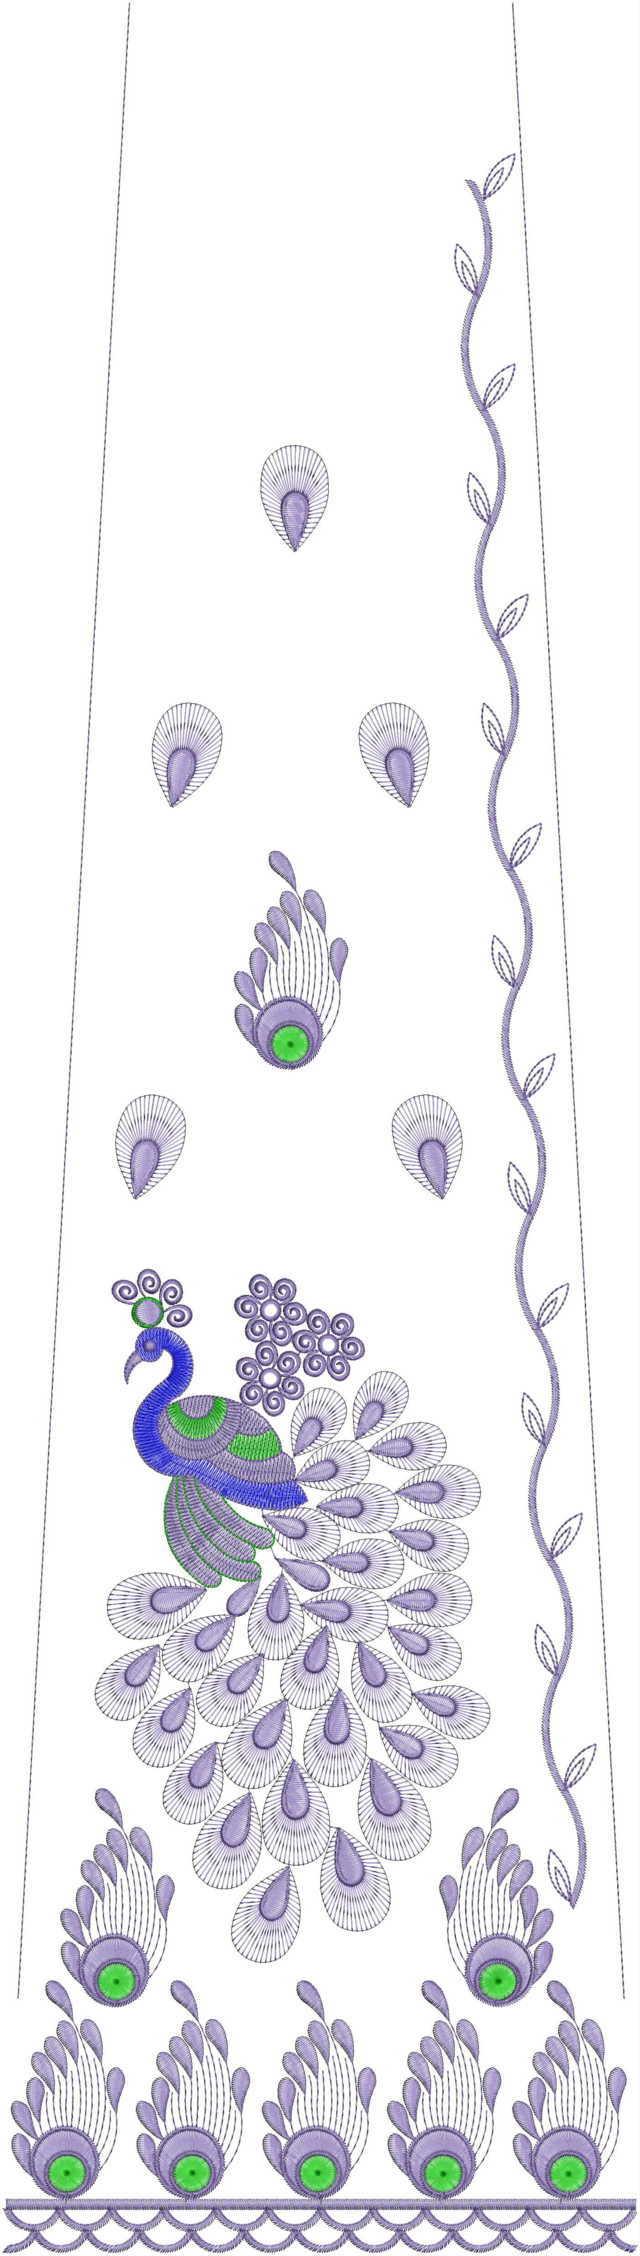 Peacock figure concept rajasthani Lehengha / kali Embroidery Design